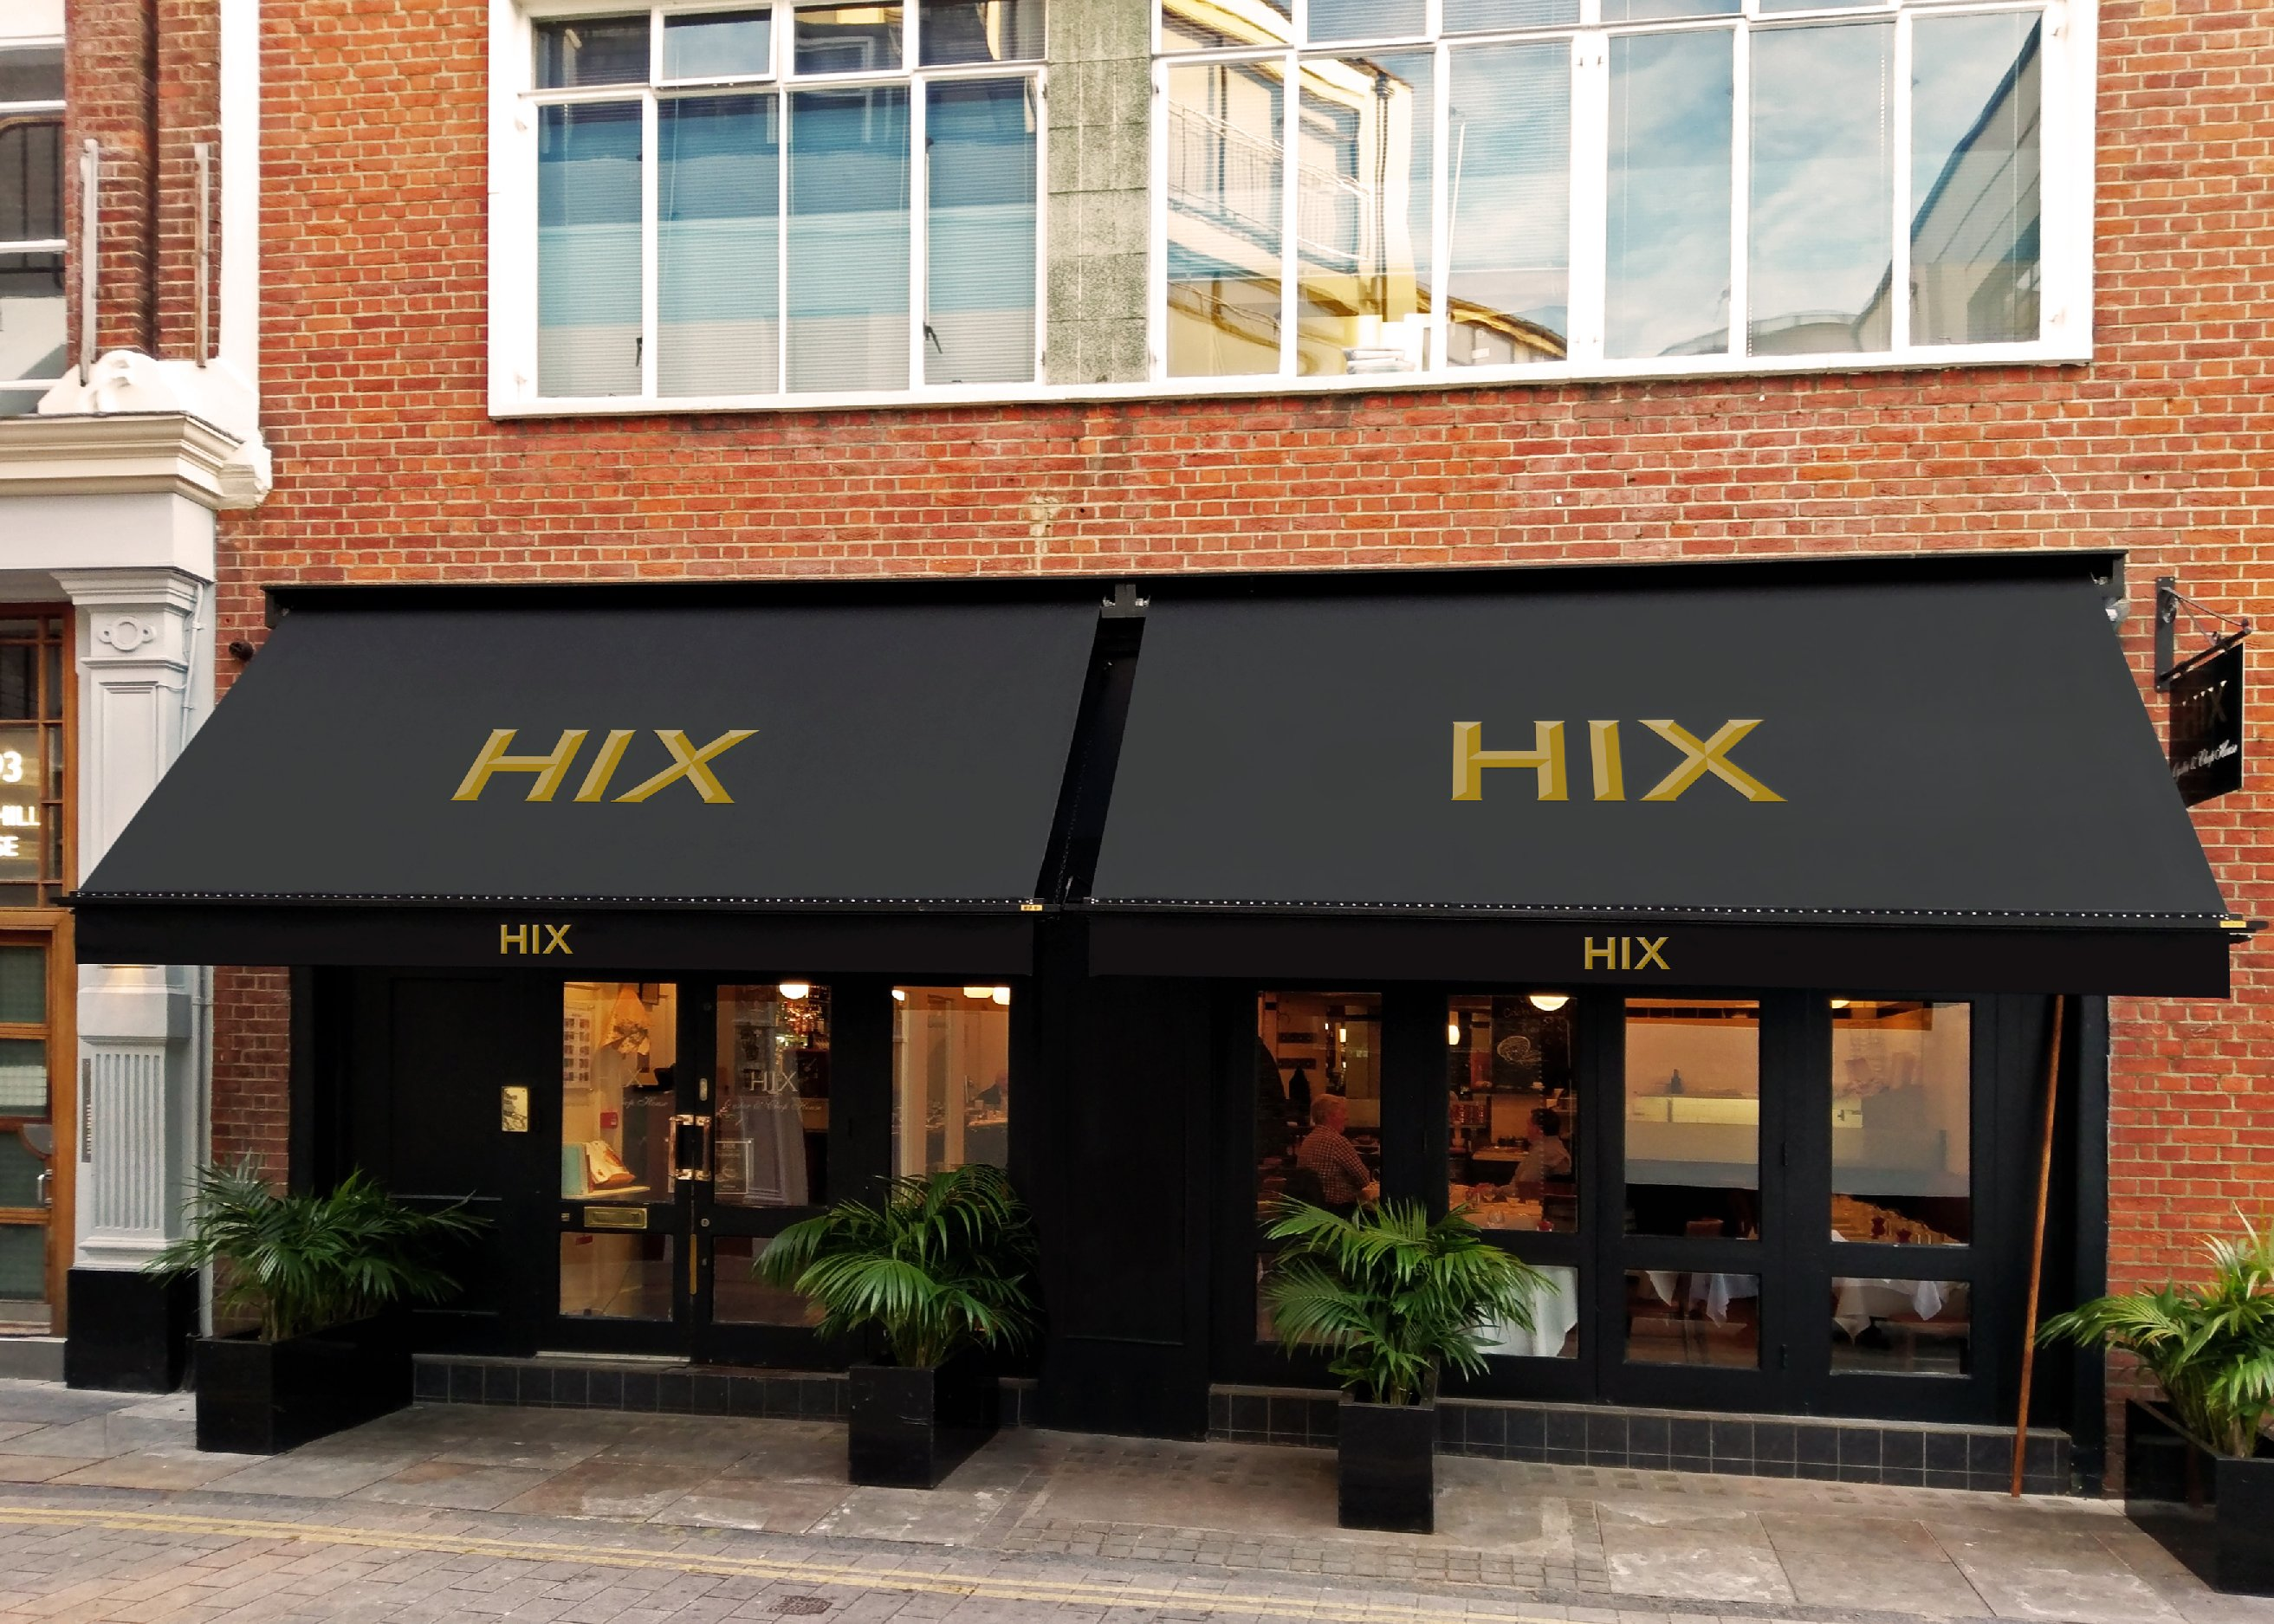 HIX Victorian awning